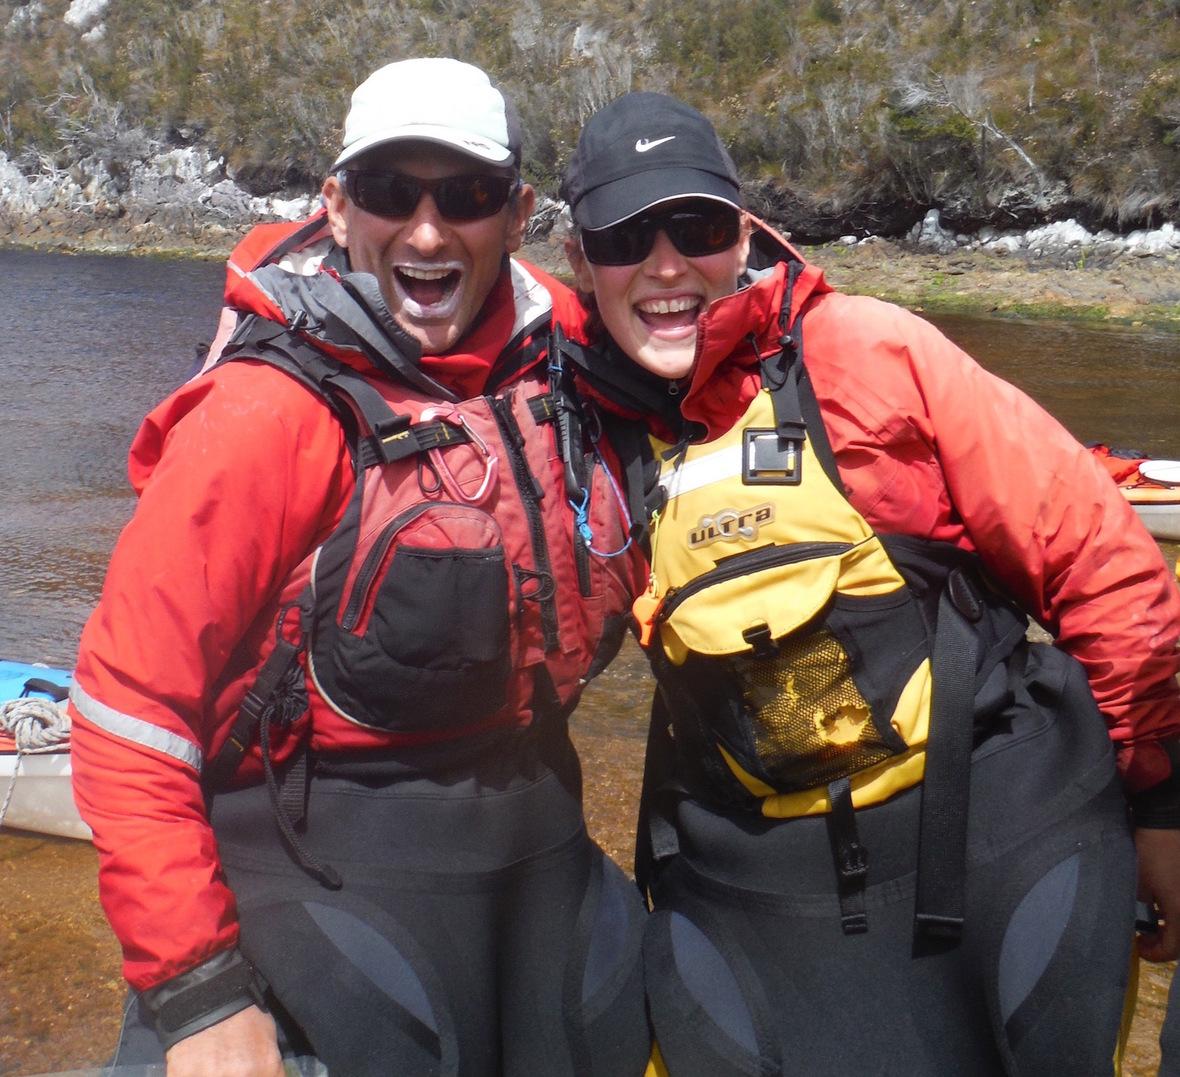 Dress for kayaking